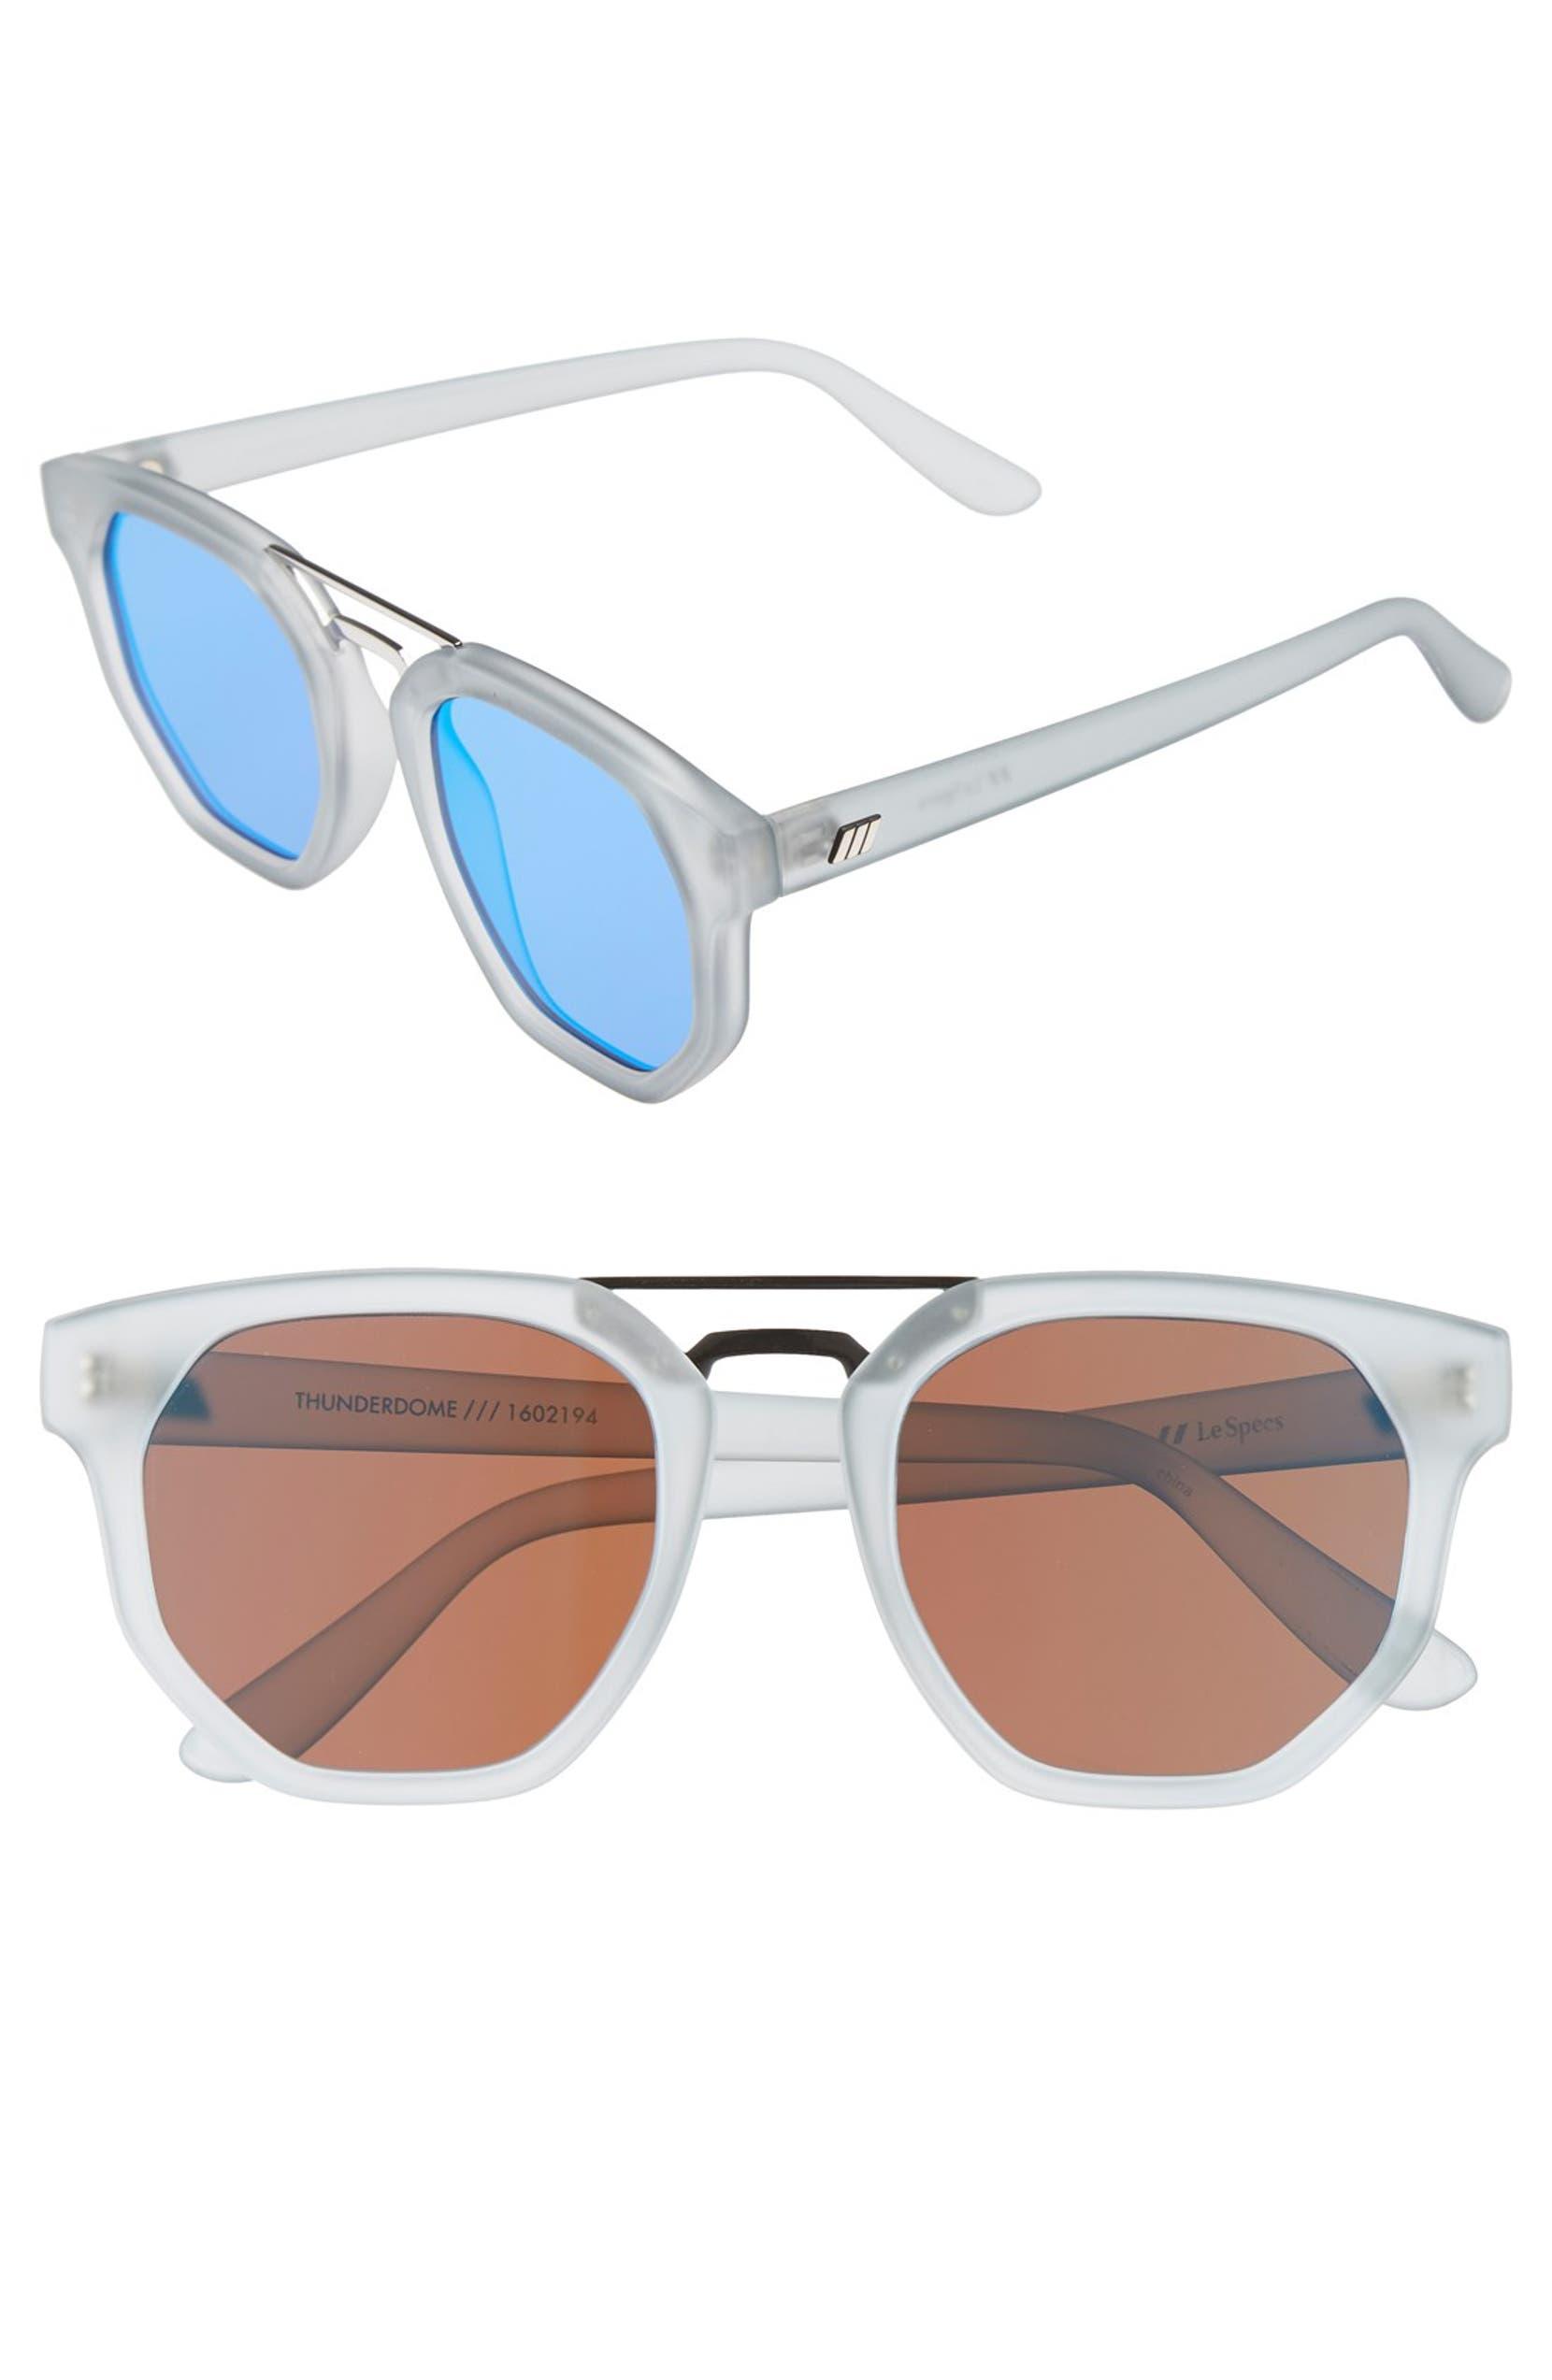 a6f4fbb269 Le Specs  Thunderdome  52mm Polarized Sunglasses